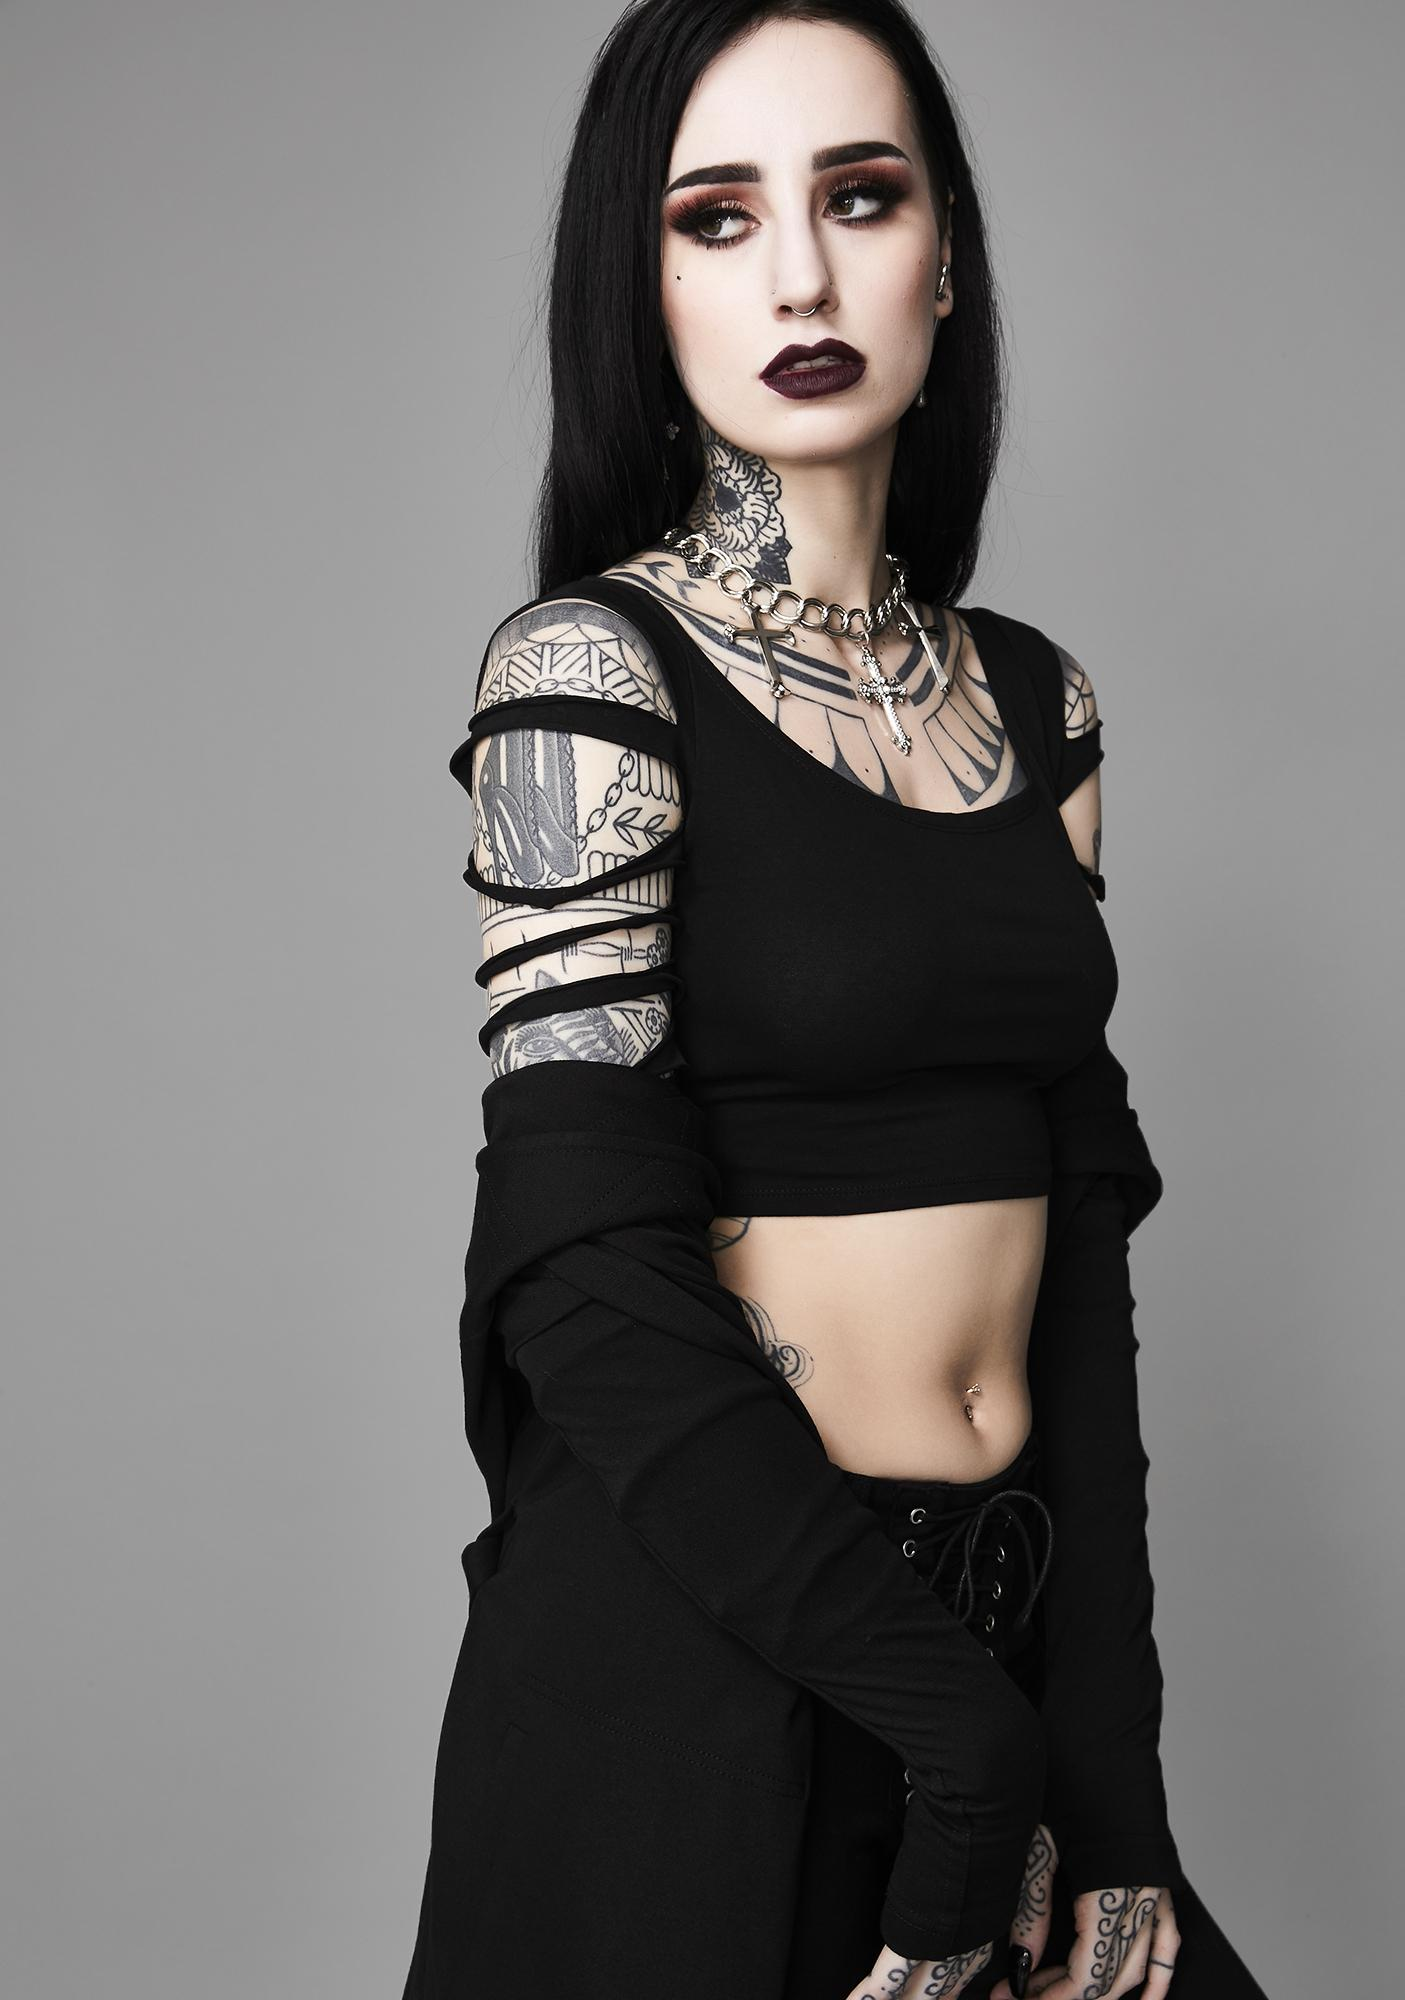 Widow Crypt Creeper Shredded Top